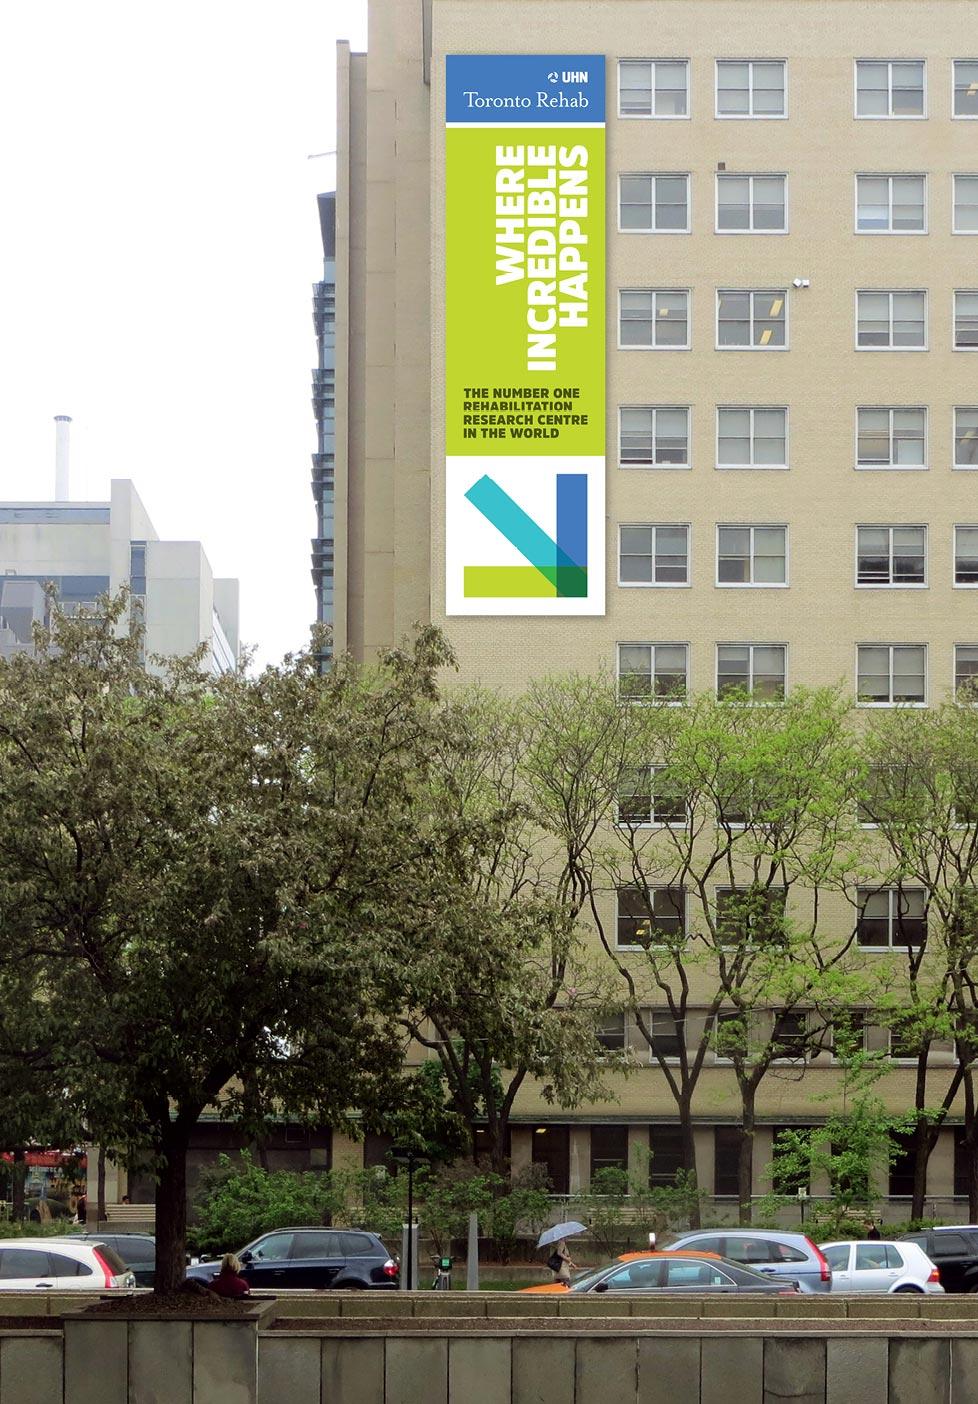 toronto-rehab-foundation-where-incredible-happens-building-ad-sputnik-design-partners.jpg